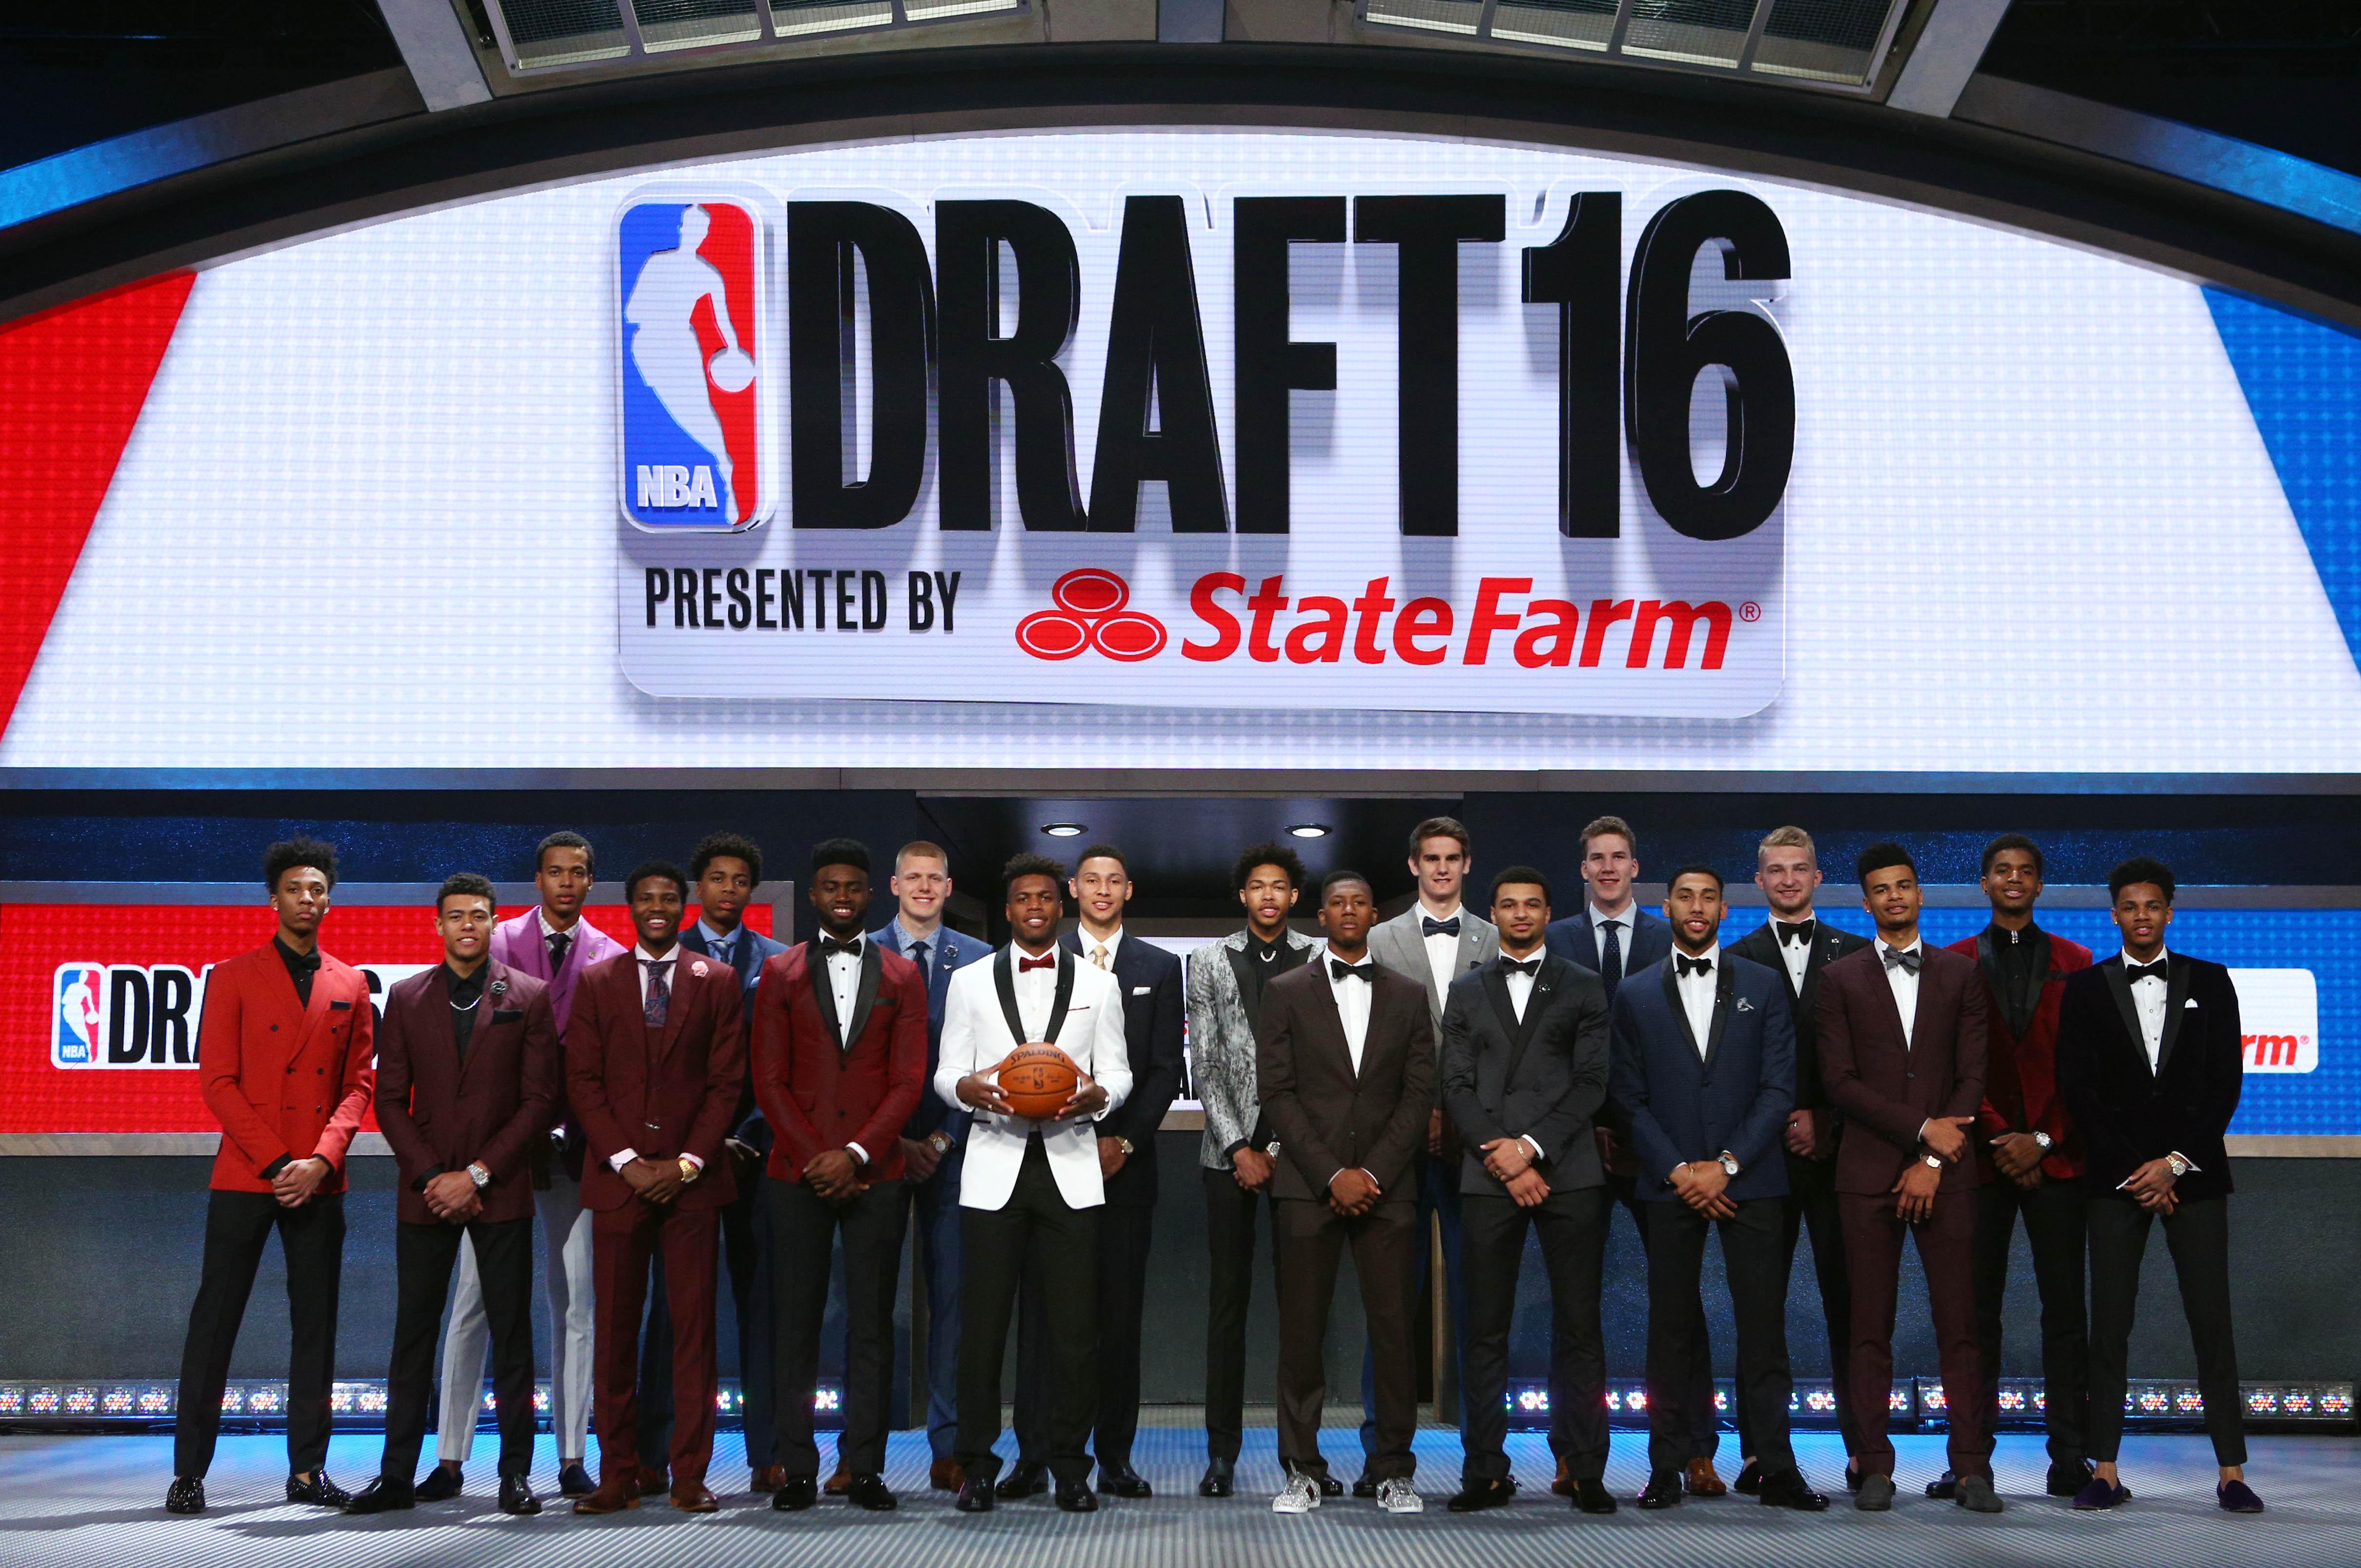 Nba Draft: Philadelphia 76ers Okay With Los Angeles 2018 Unprotected